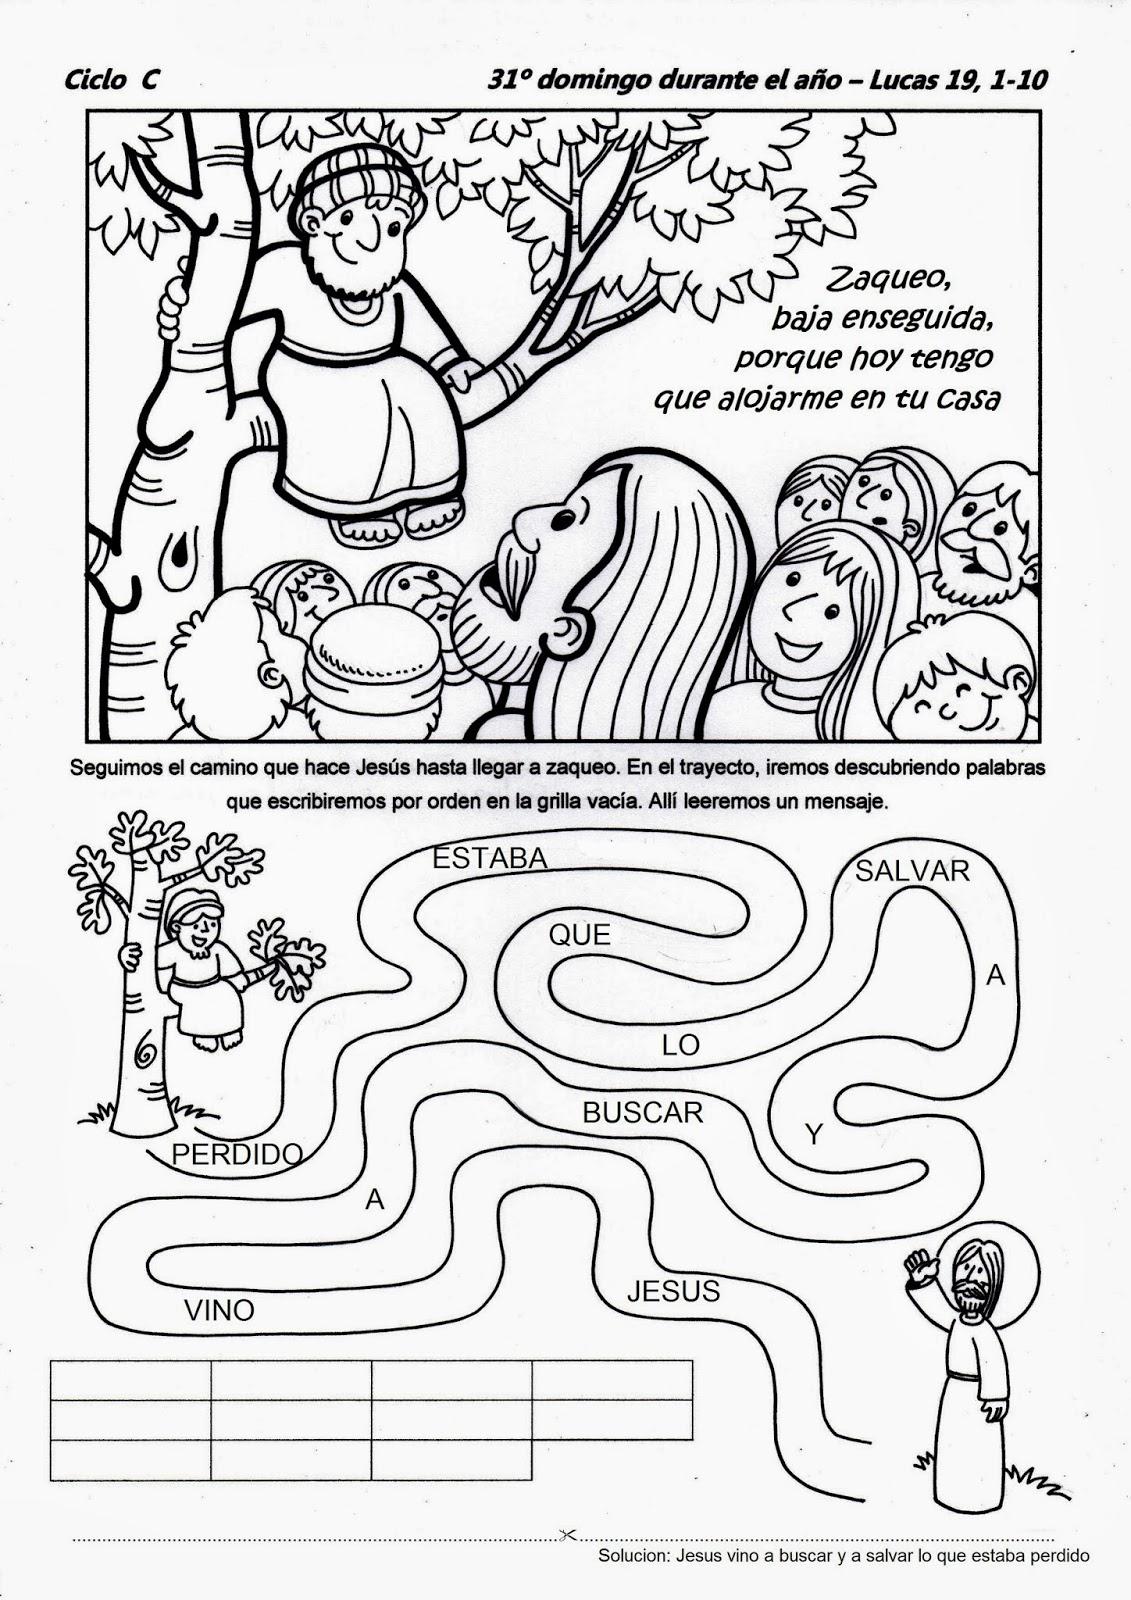 Muerte De Jesus in addition nazarenojaguariuna lojasdobem further Iglesia Nacional Presbiteriana De M C3 A9xico 68836 together with Crucifixion De Jesus in addition Velacion Jesus Nazareno San Juan Dios 2017 Quetzaltenango. on iglesia del nazareno